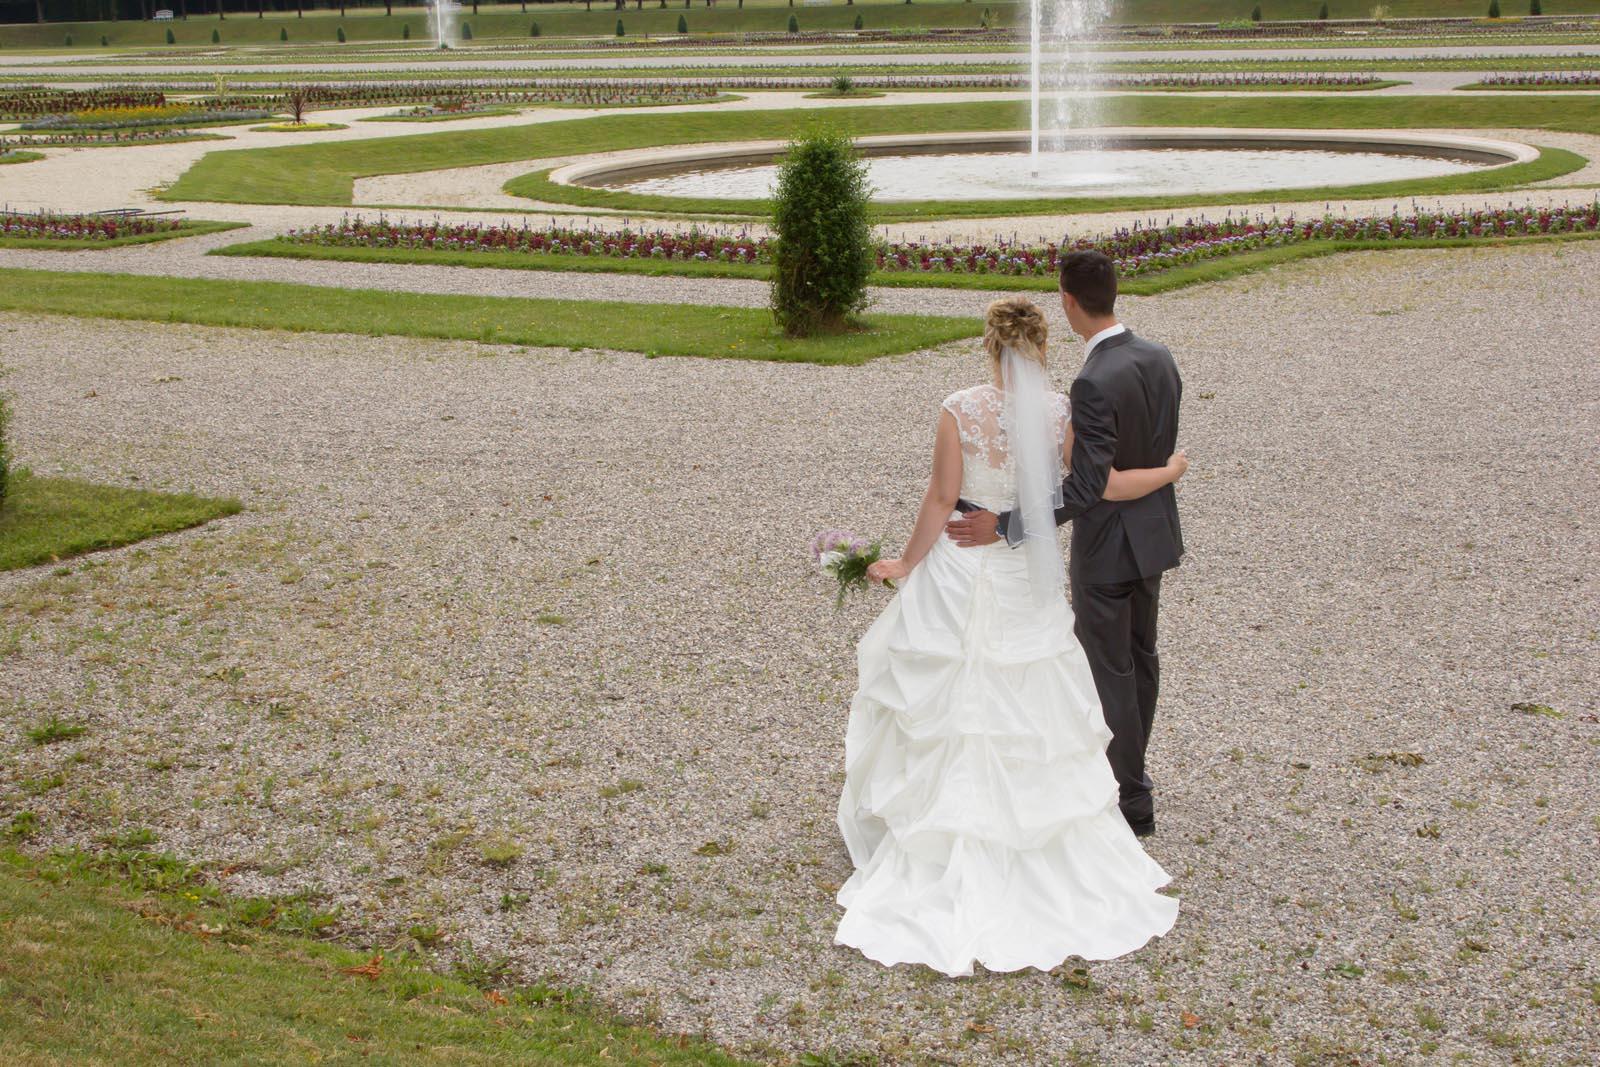 Hochzeit-Portraits-Jacob-Kirche-Hochzeit-Jacob-7253.jpg